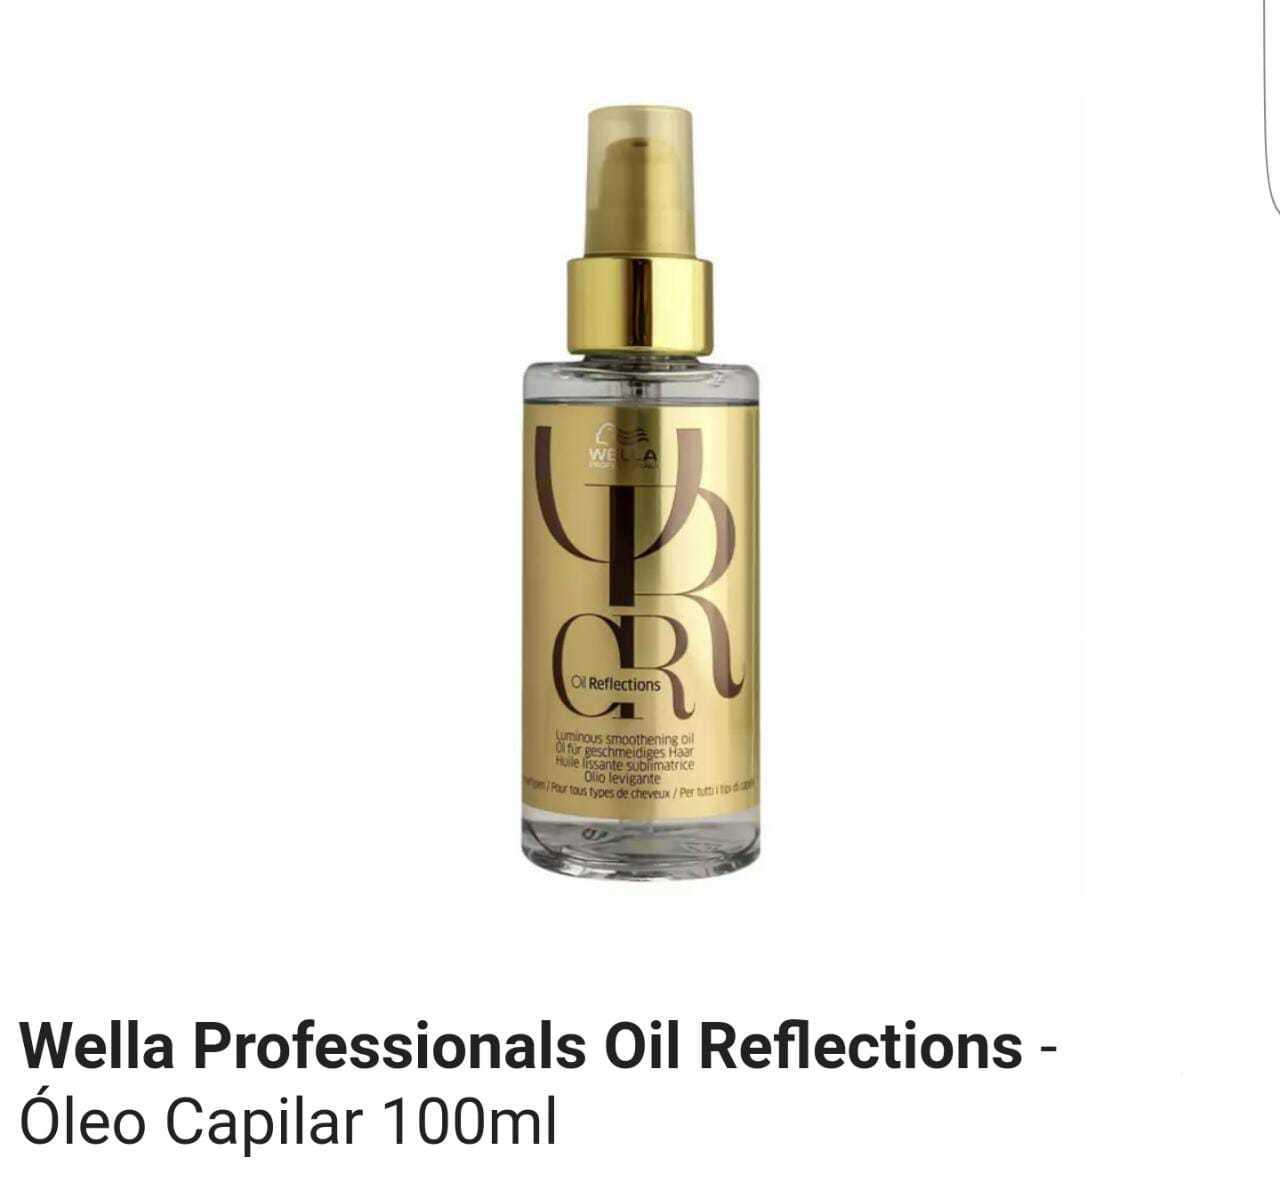 Óleo Capilar Wella Oil Reflections 100 ml MS Cosmético